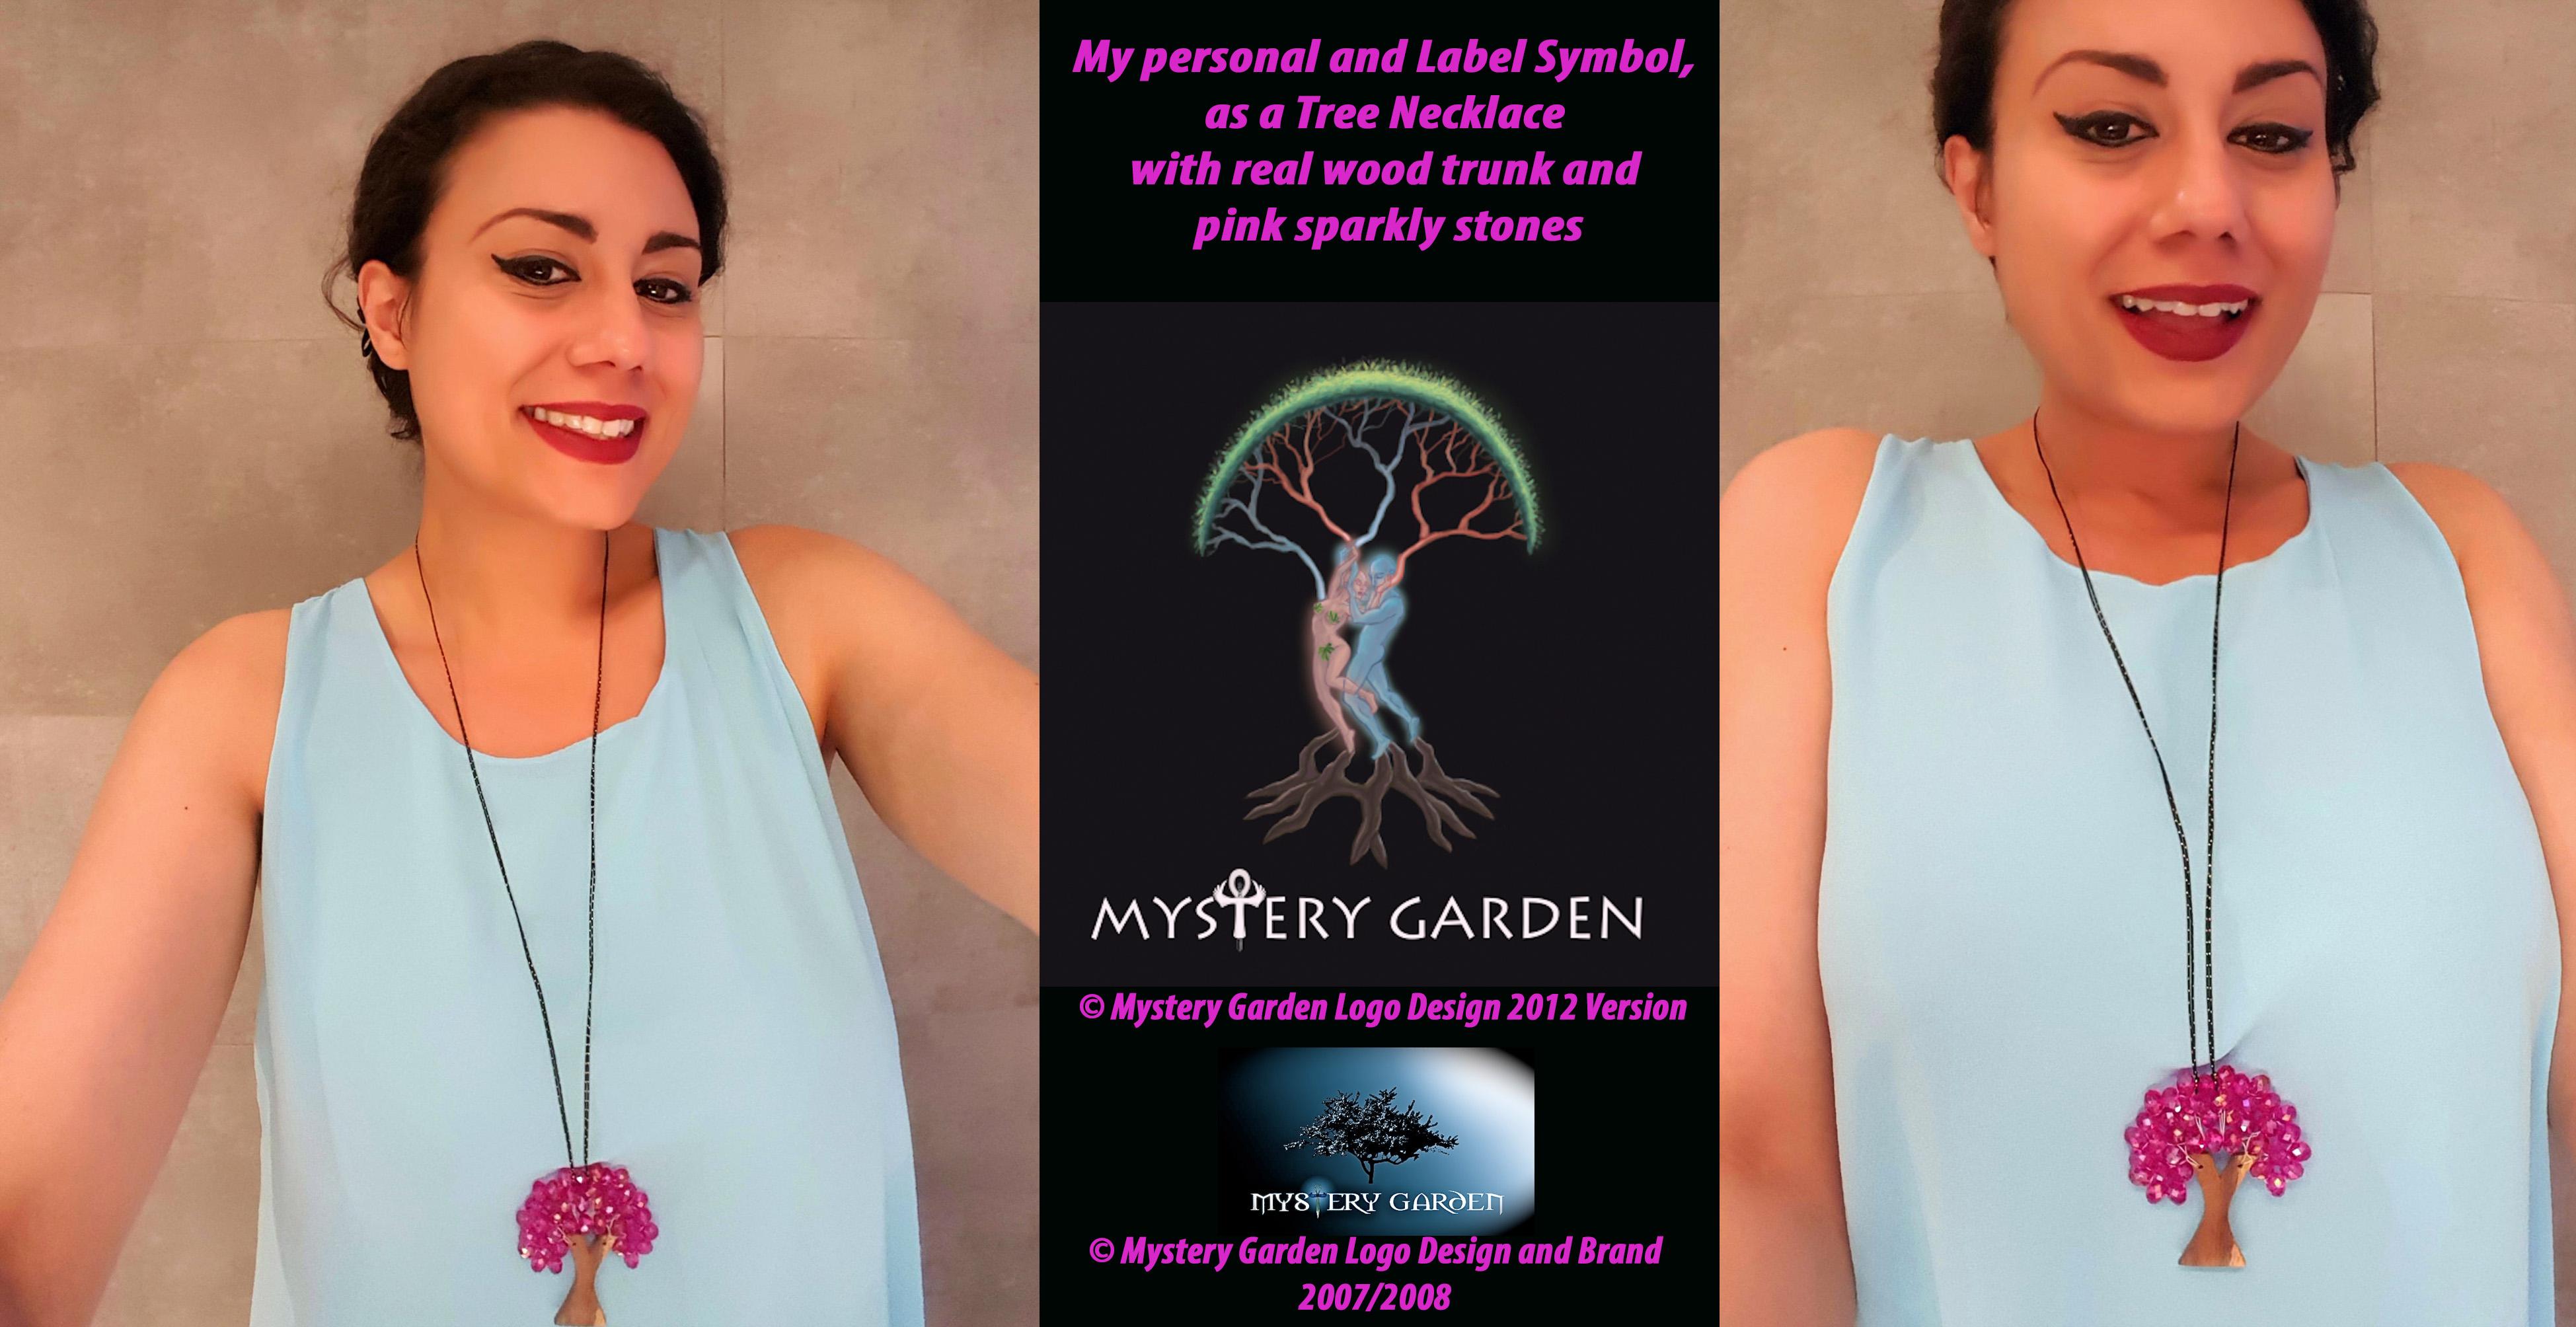 Susan Elsa Label MGP Logo and personal Symbol Tree © Susan Elsa Music-Movies-Fashion Blog Official